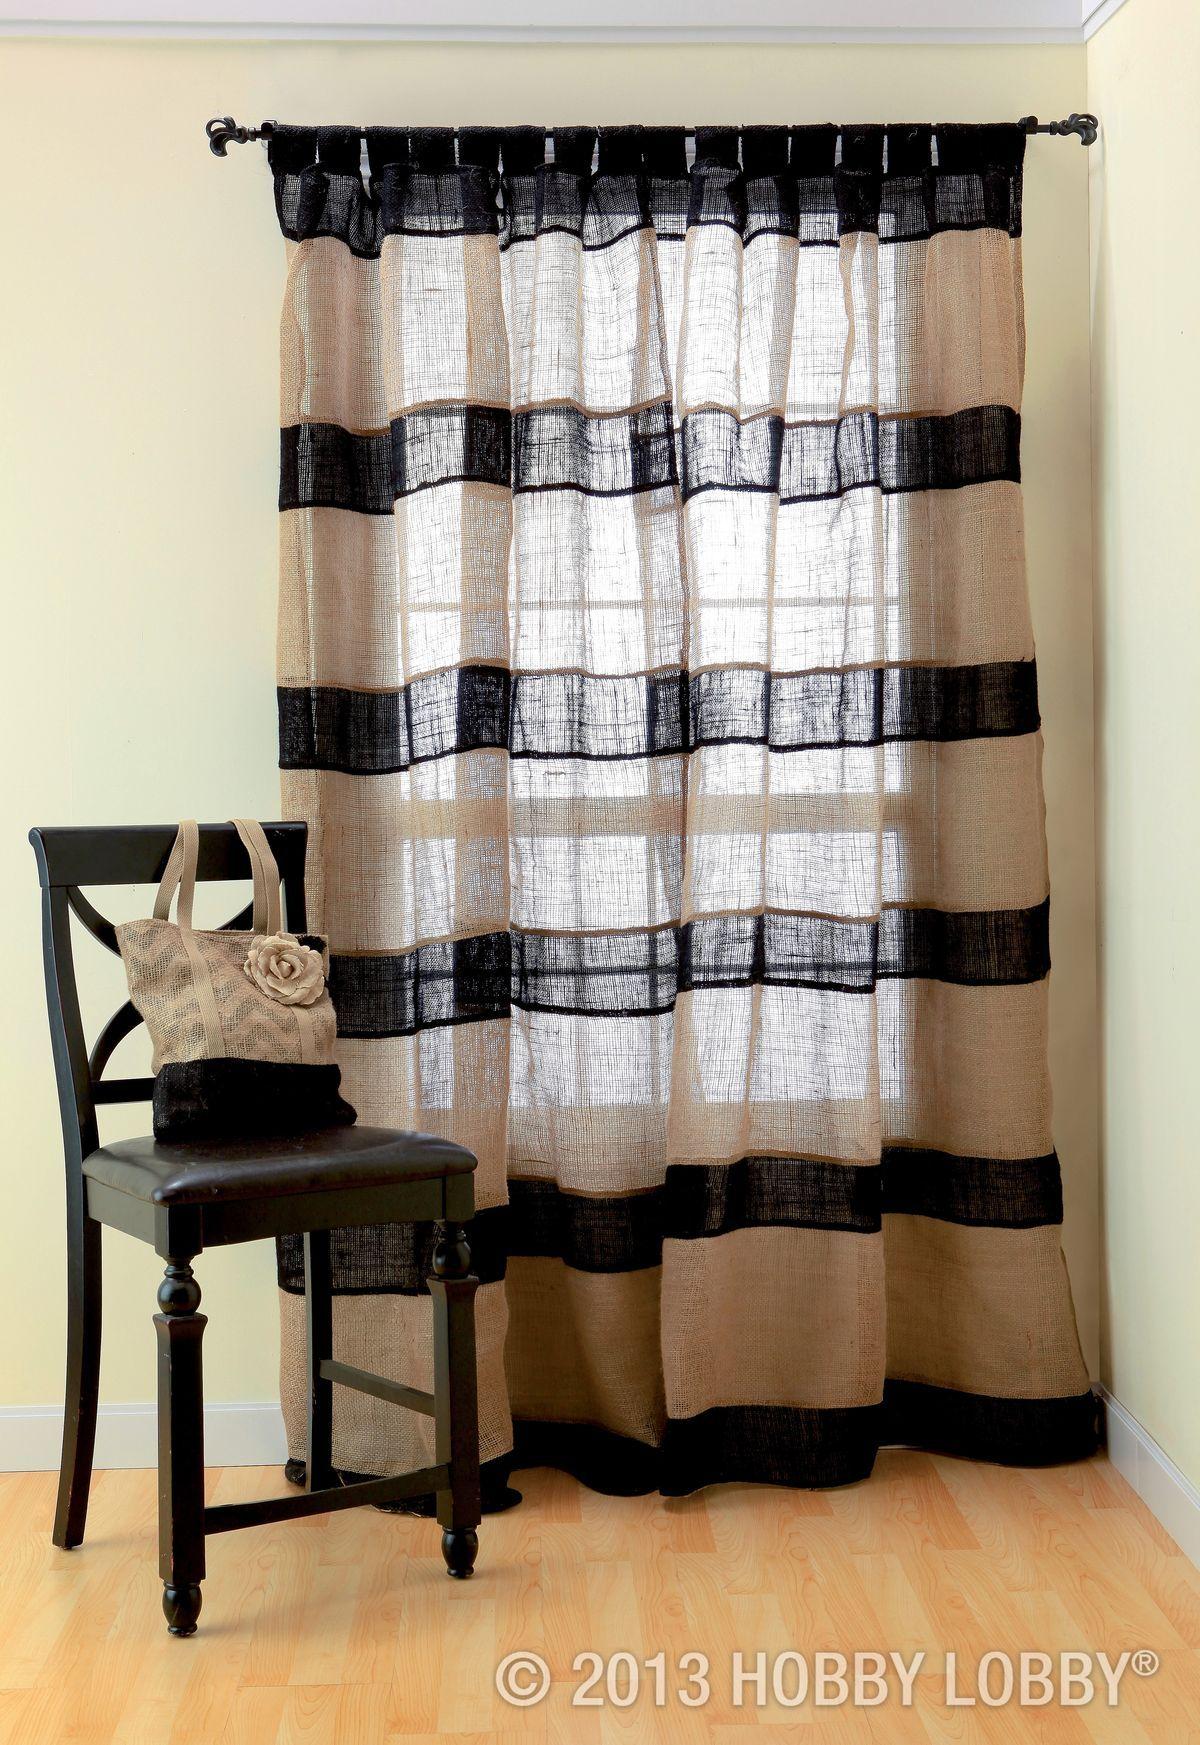 Diy Burlap Curtains Make A Stylish Addition To Your Home Decor Home Decor Home Decor